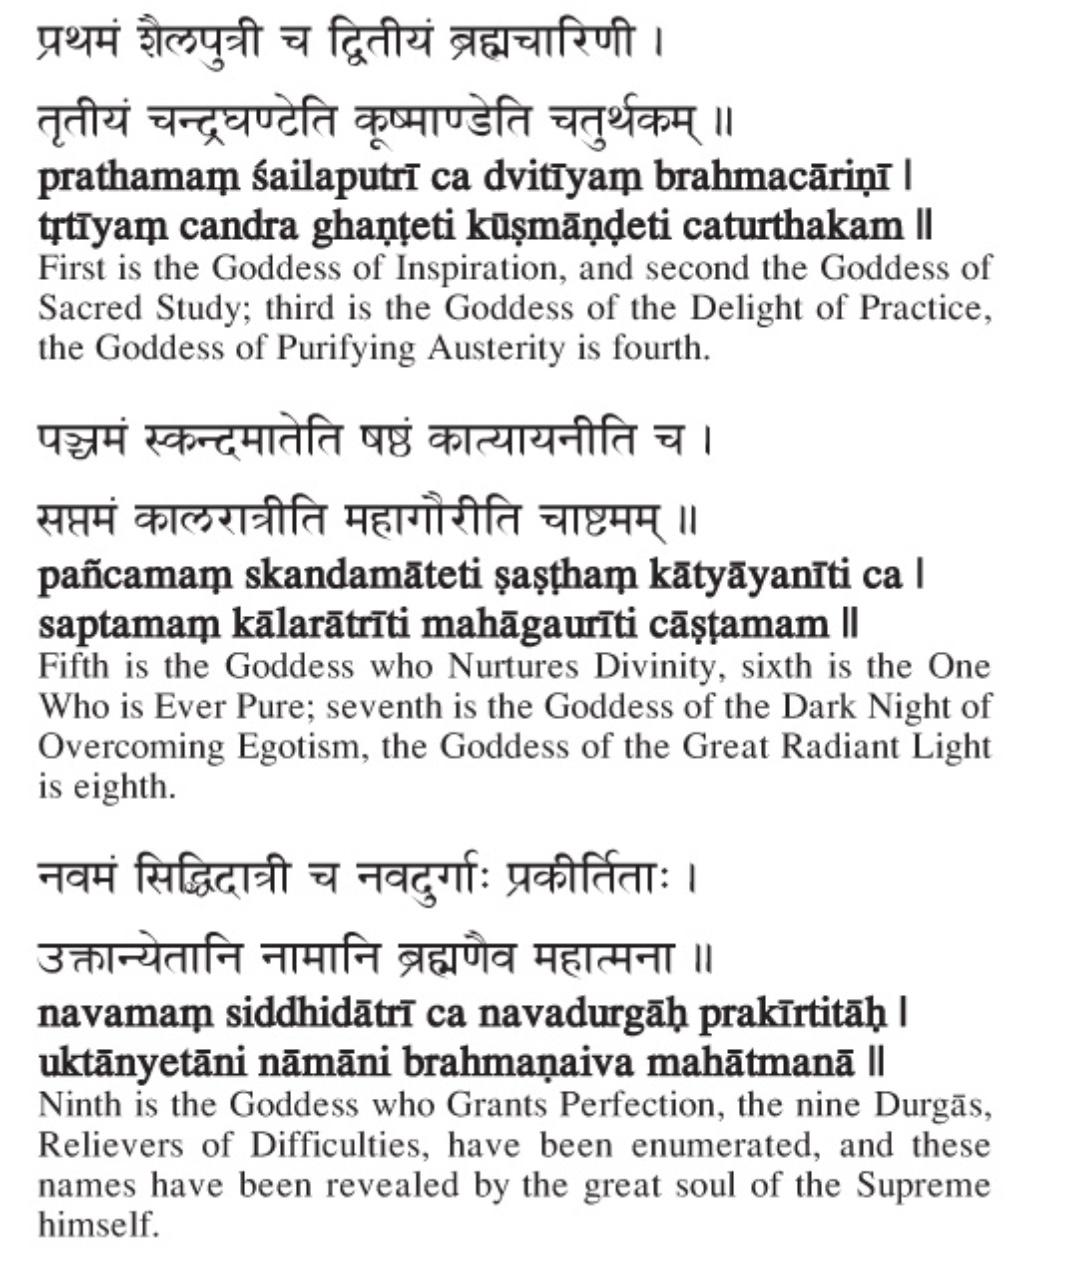 From Swami Satyananda Saraswati's translation of the Devimahattmya